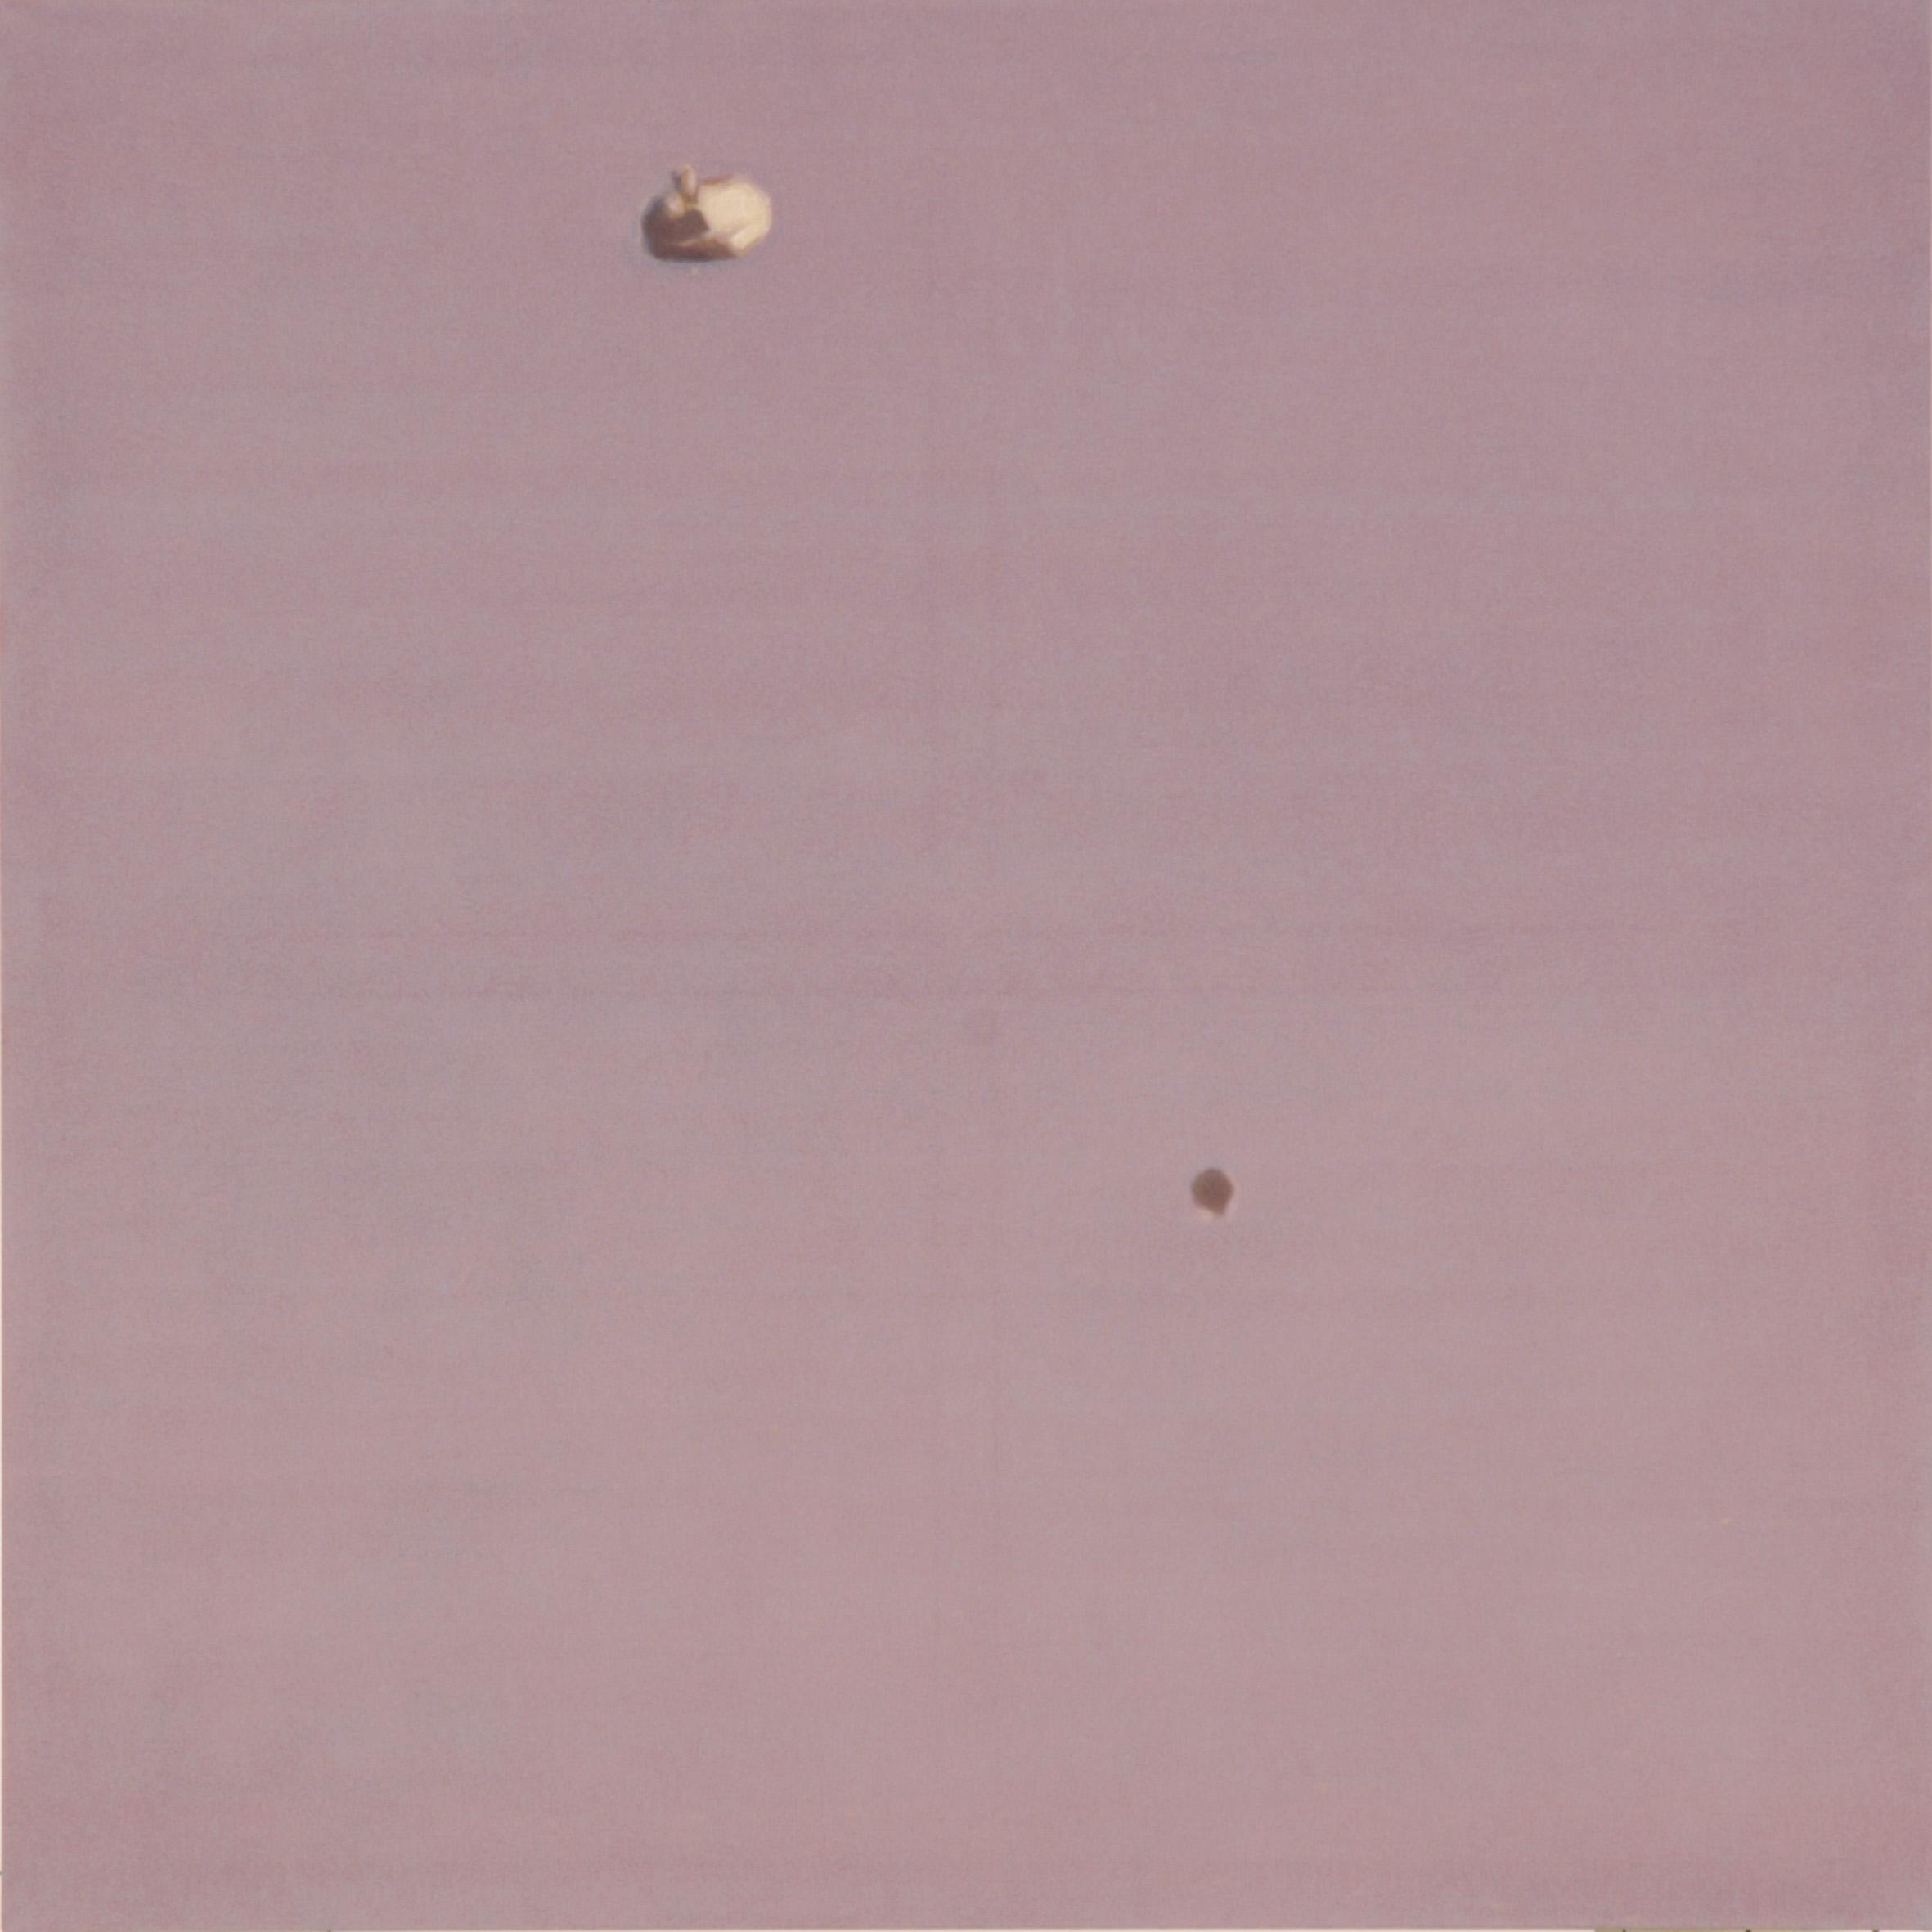 ADAM NORTON  UFO 8 2006 acrylic on canvas  122 ×122 cm